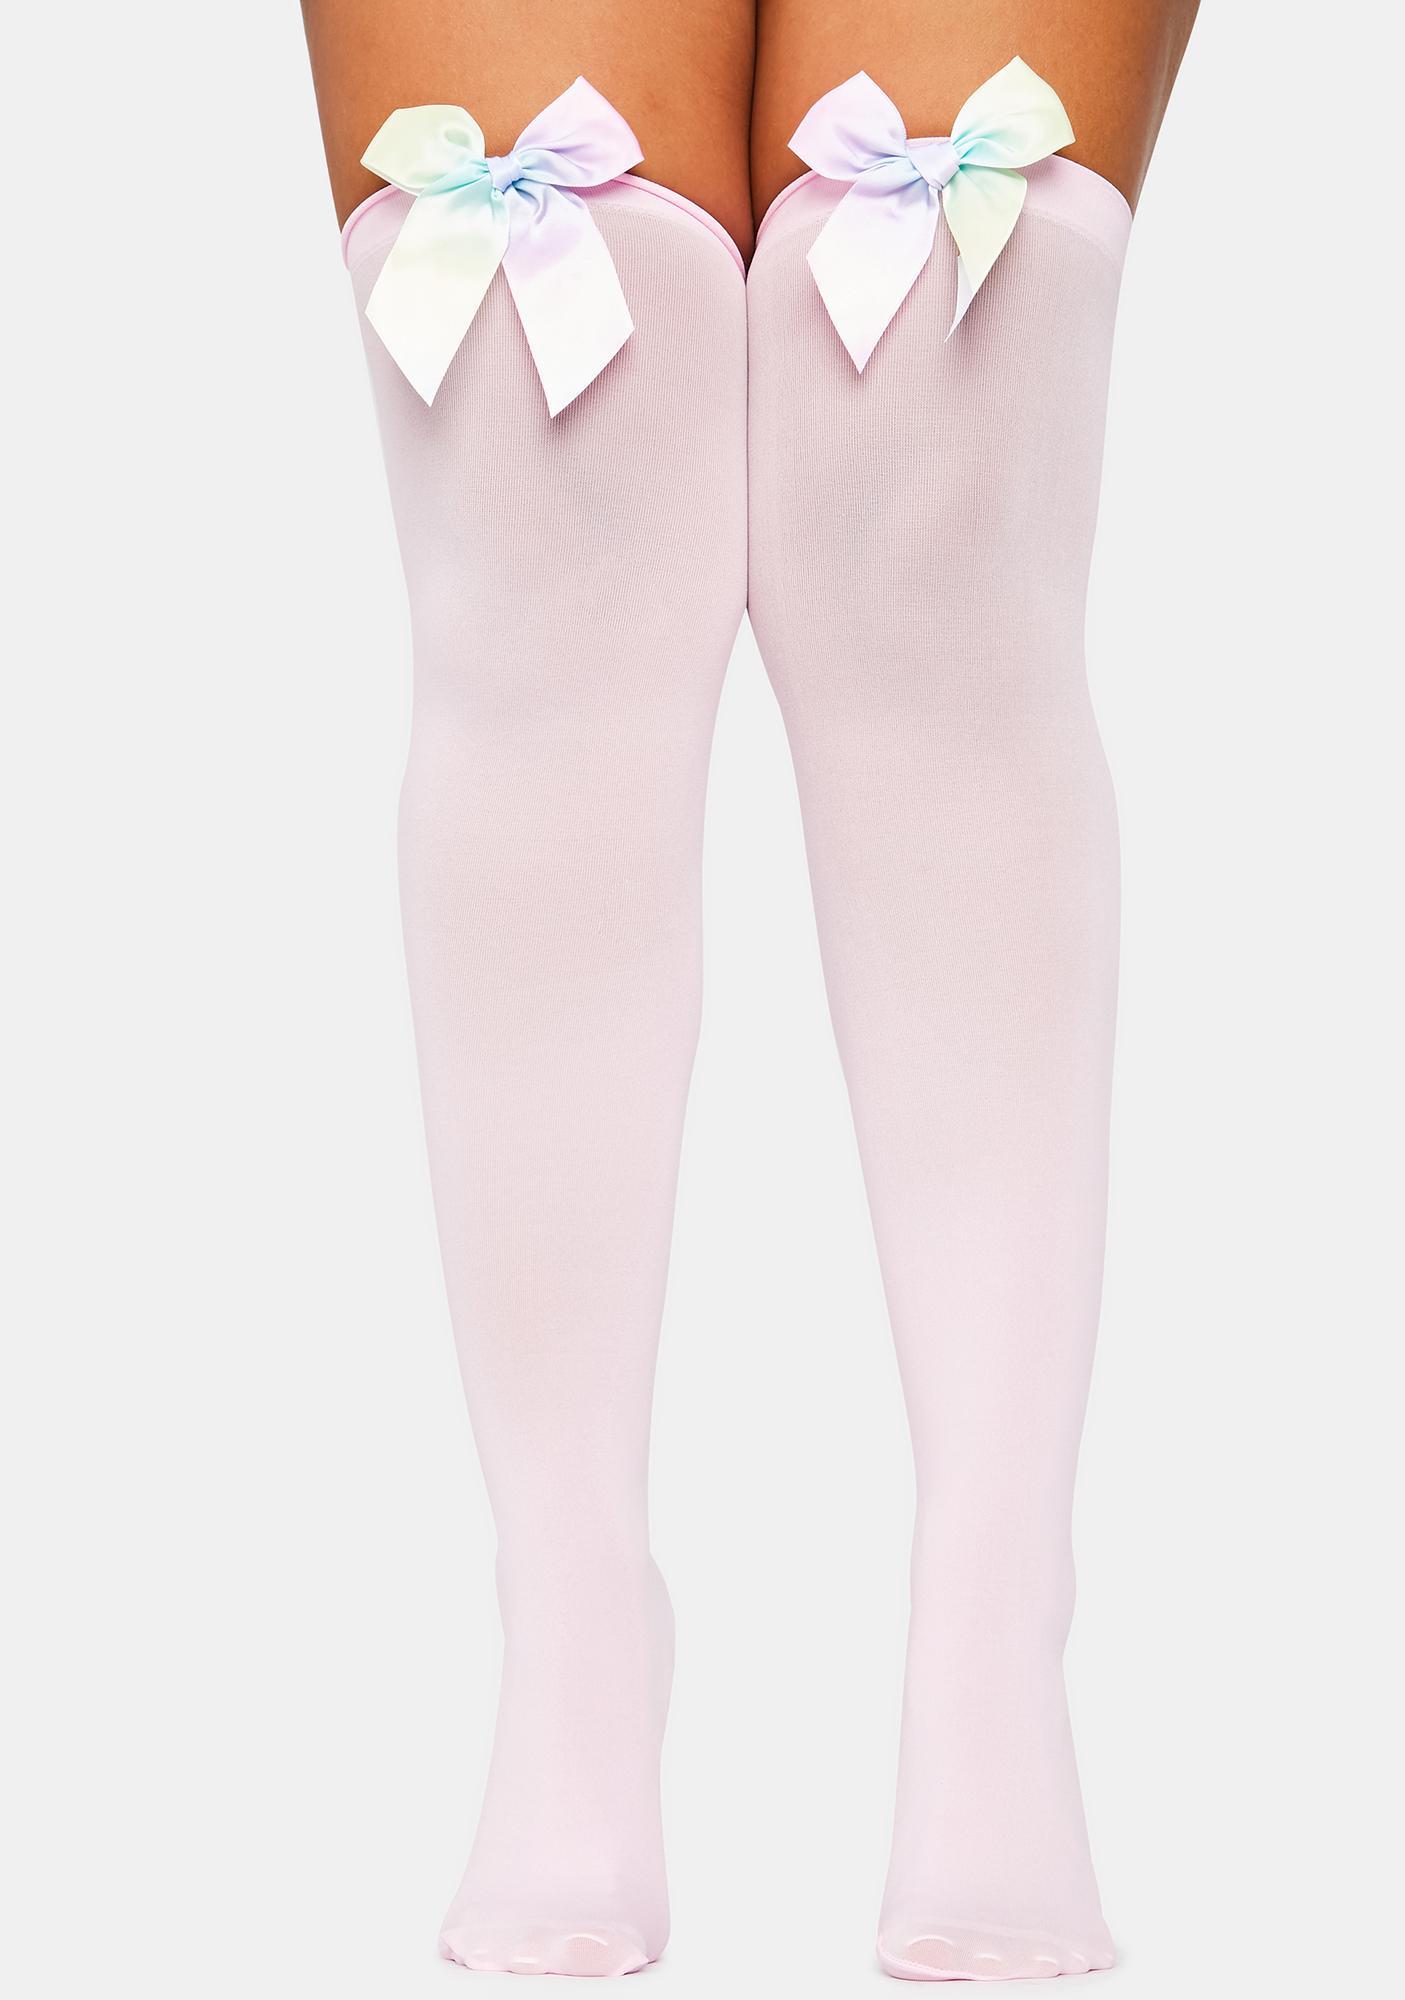 Sweet Thing Thigh High Socks